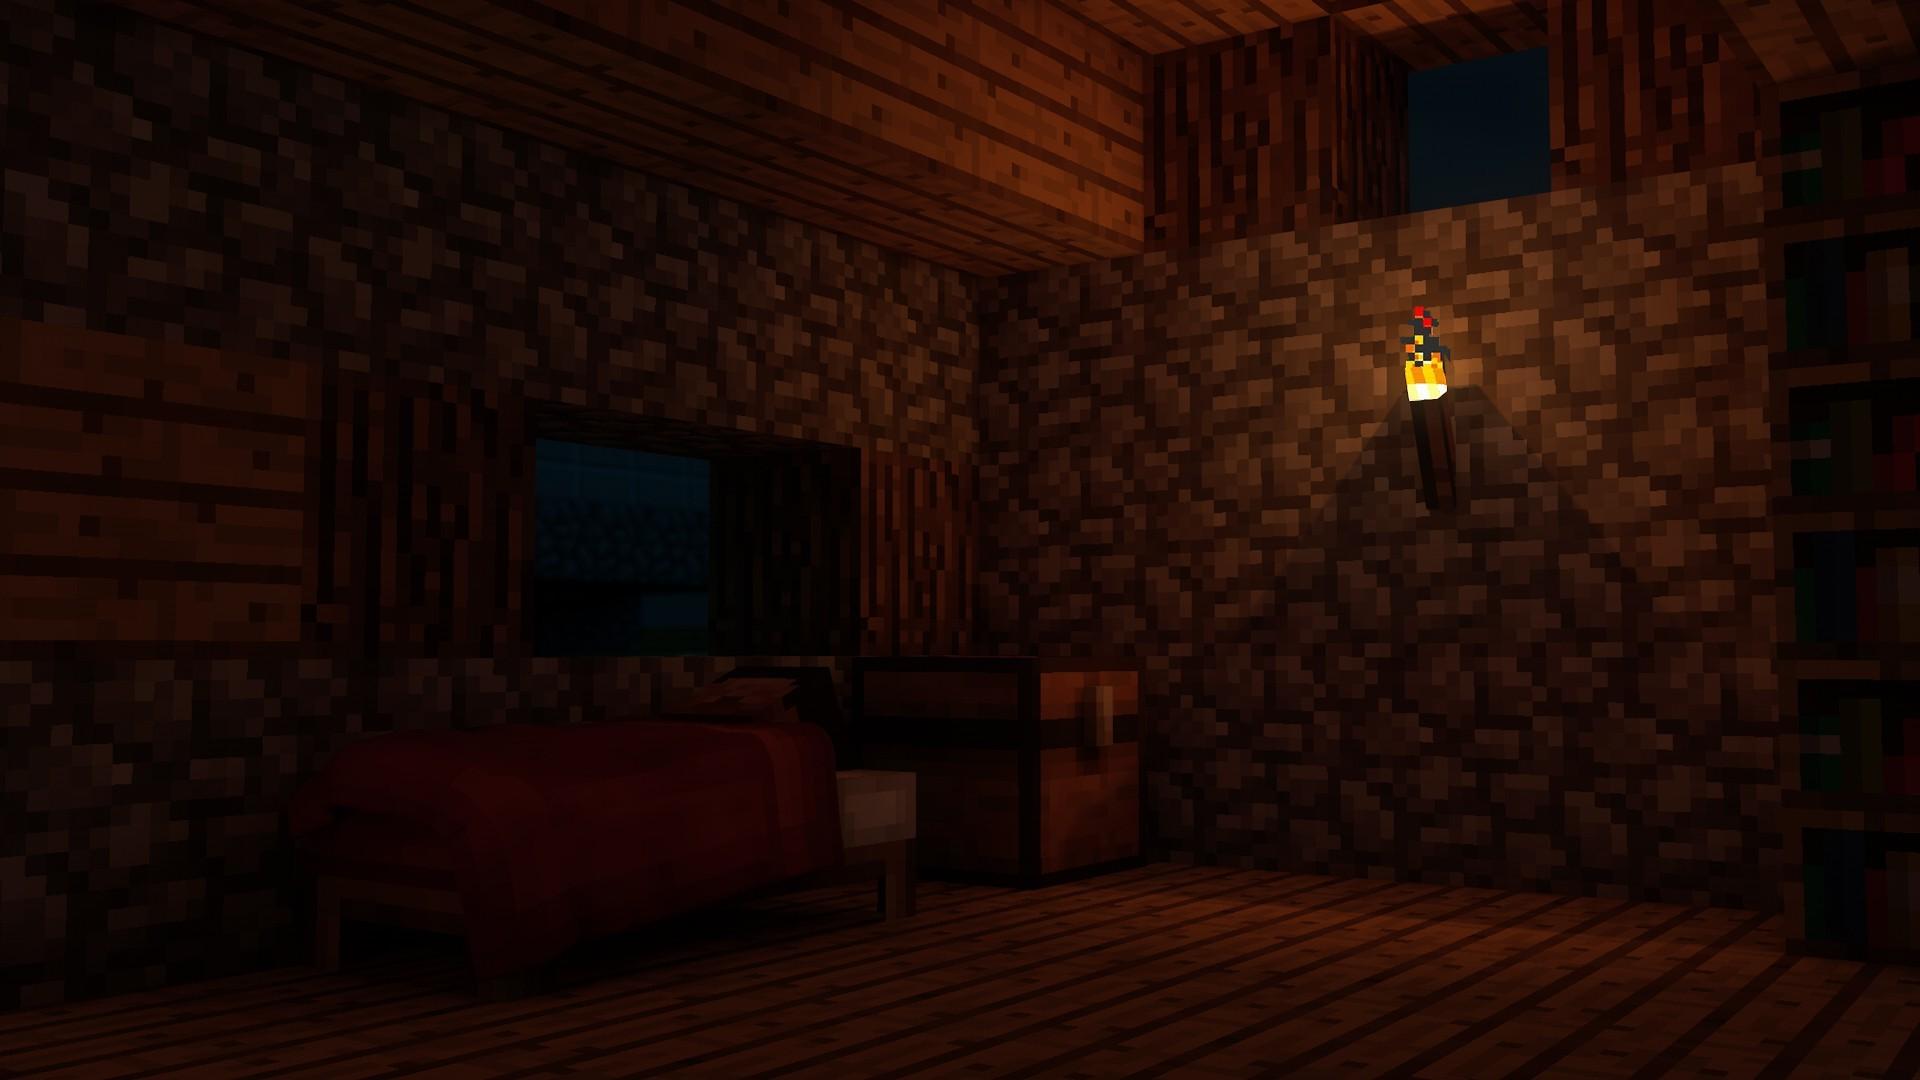 Wonderful Wallpaper Minecraft Night - video-games-night-room-bed-sleeping-house-Minecraft-estate-lighting-darkness-mansion-screenshot-1920x1080-px-715646  Picture_192374.jpg